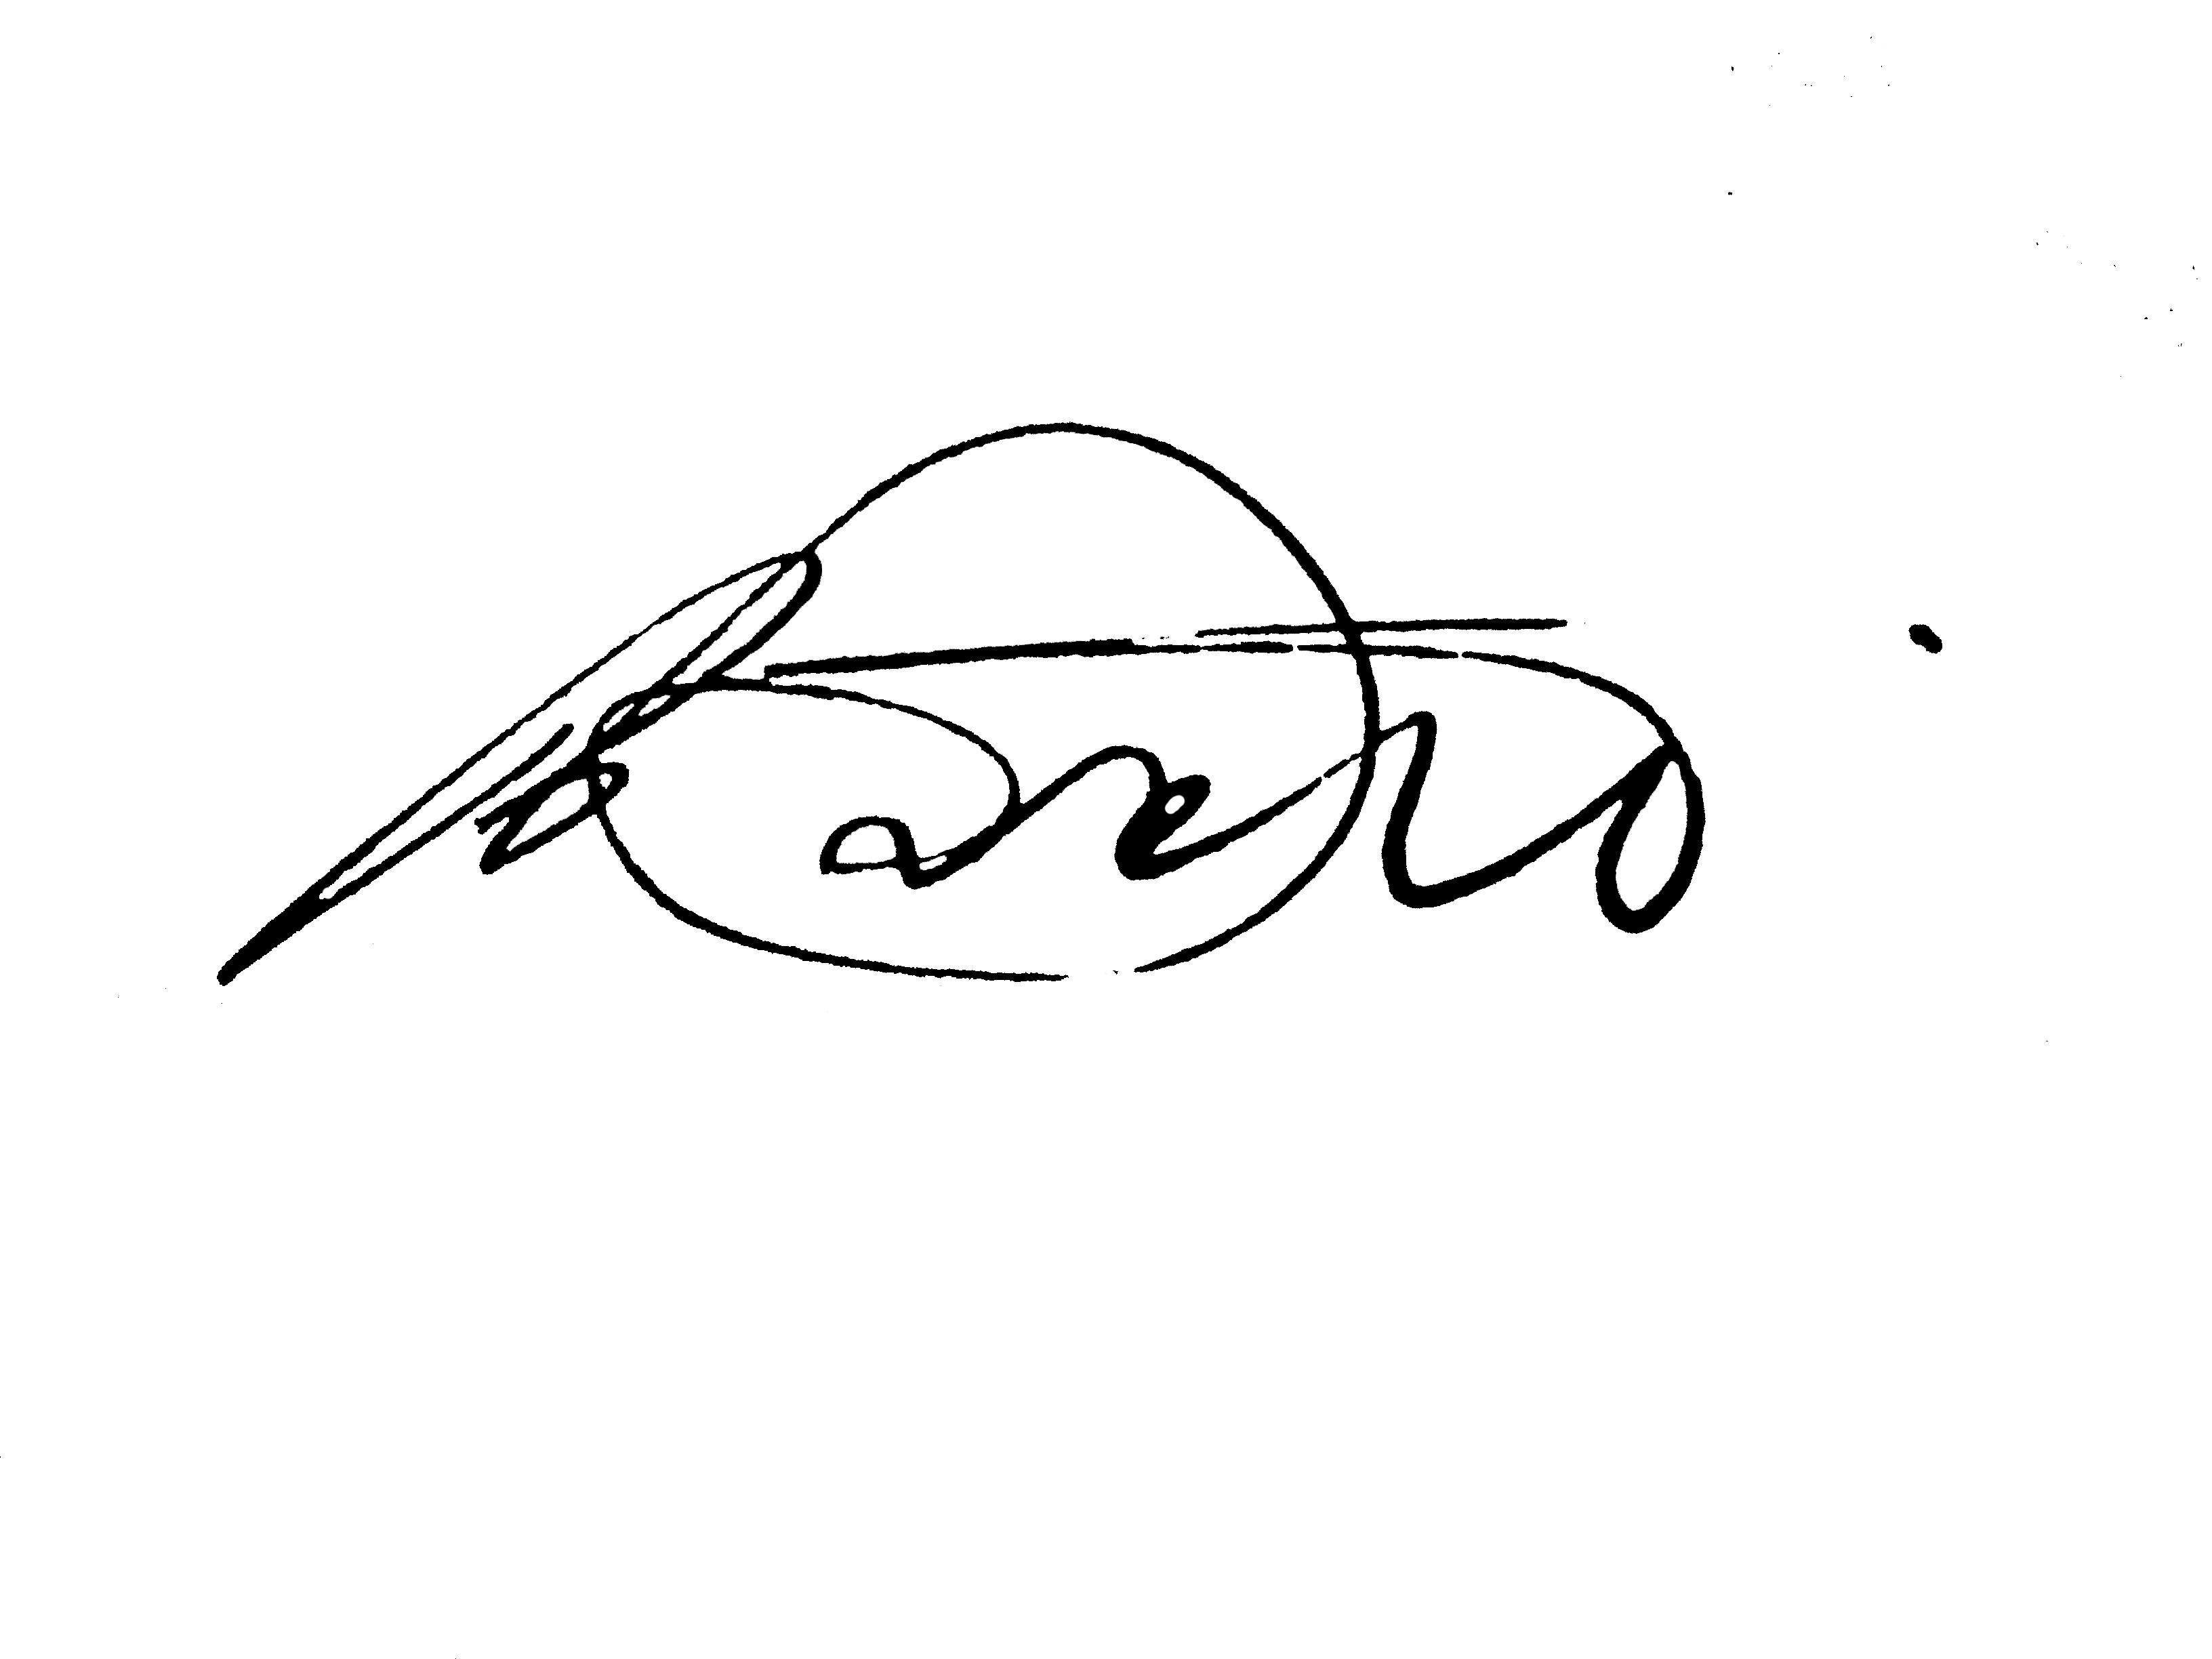 Paolo Pisani's Signature